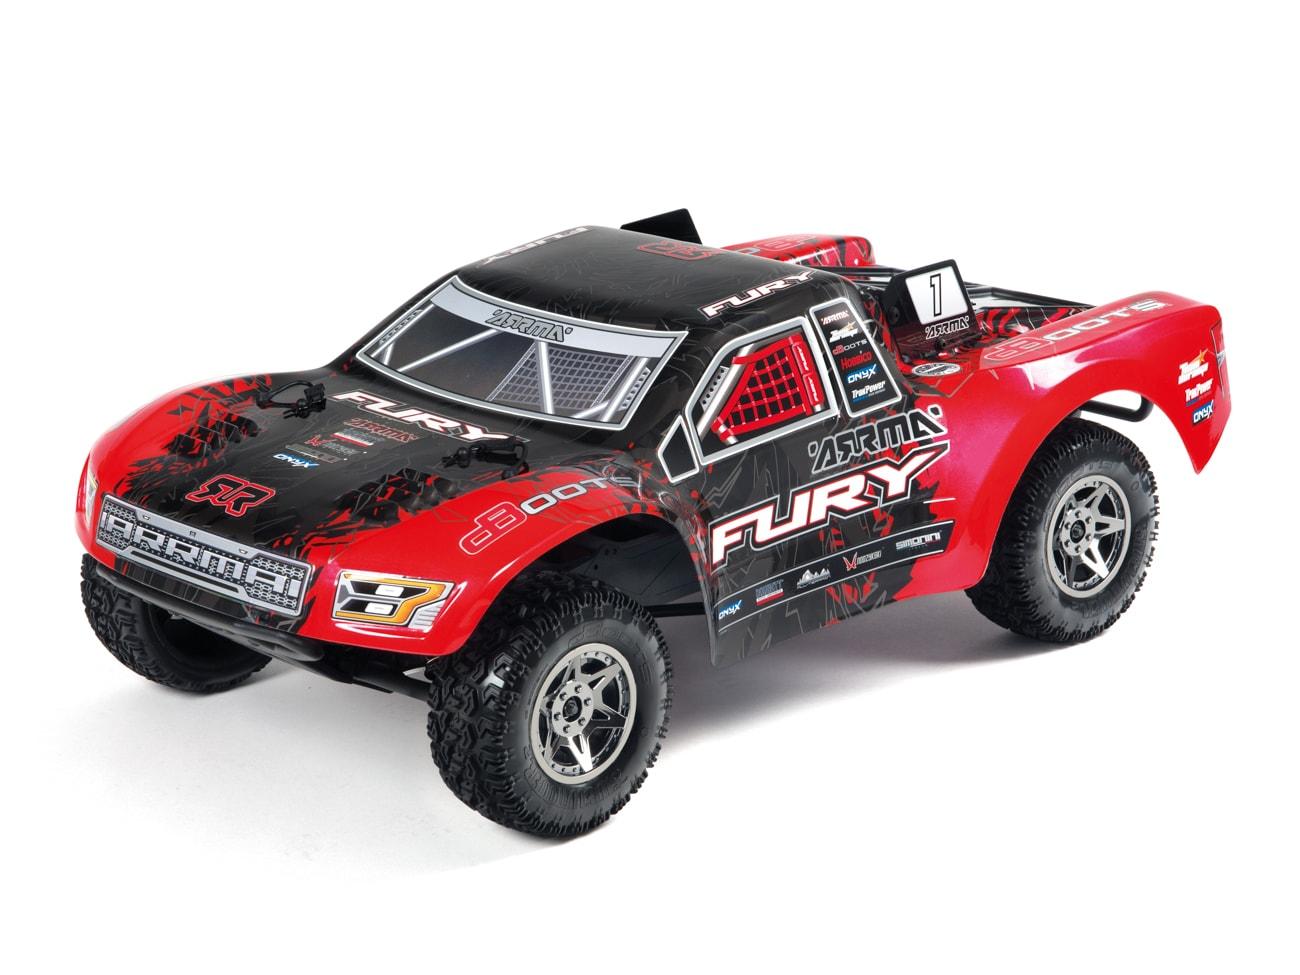 ARRMA Fury BLX 1/10 Short Course Truck